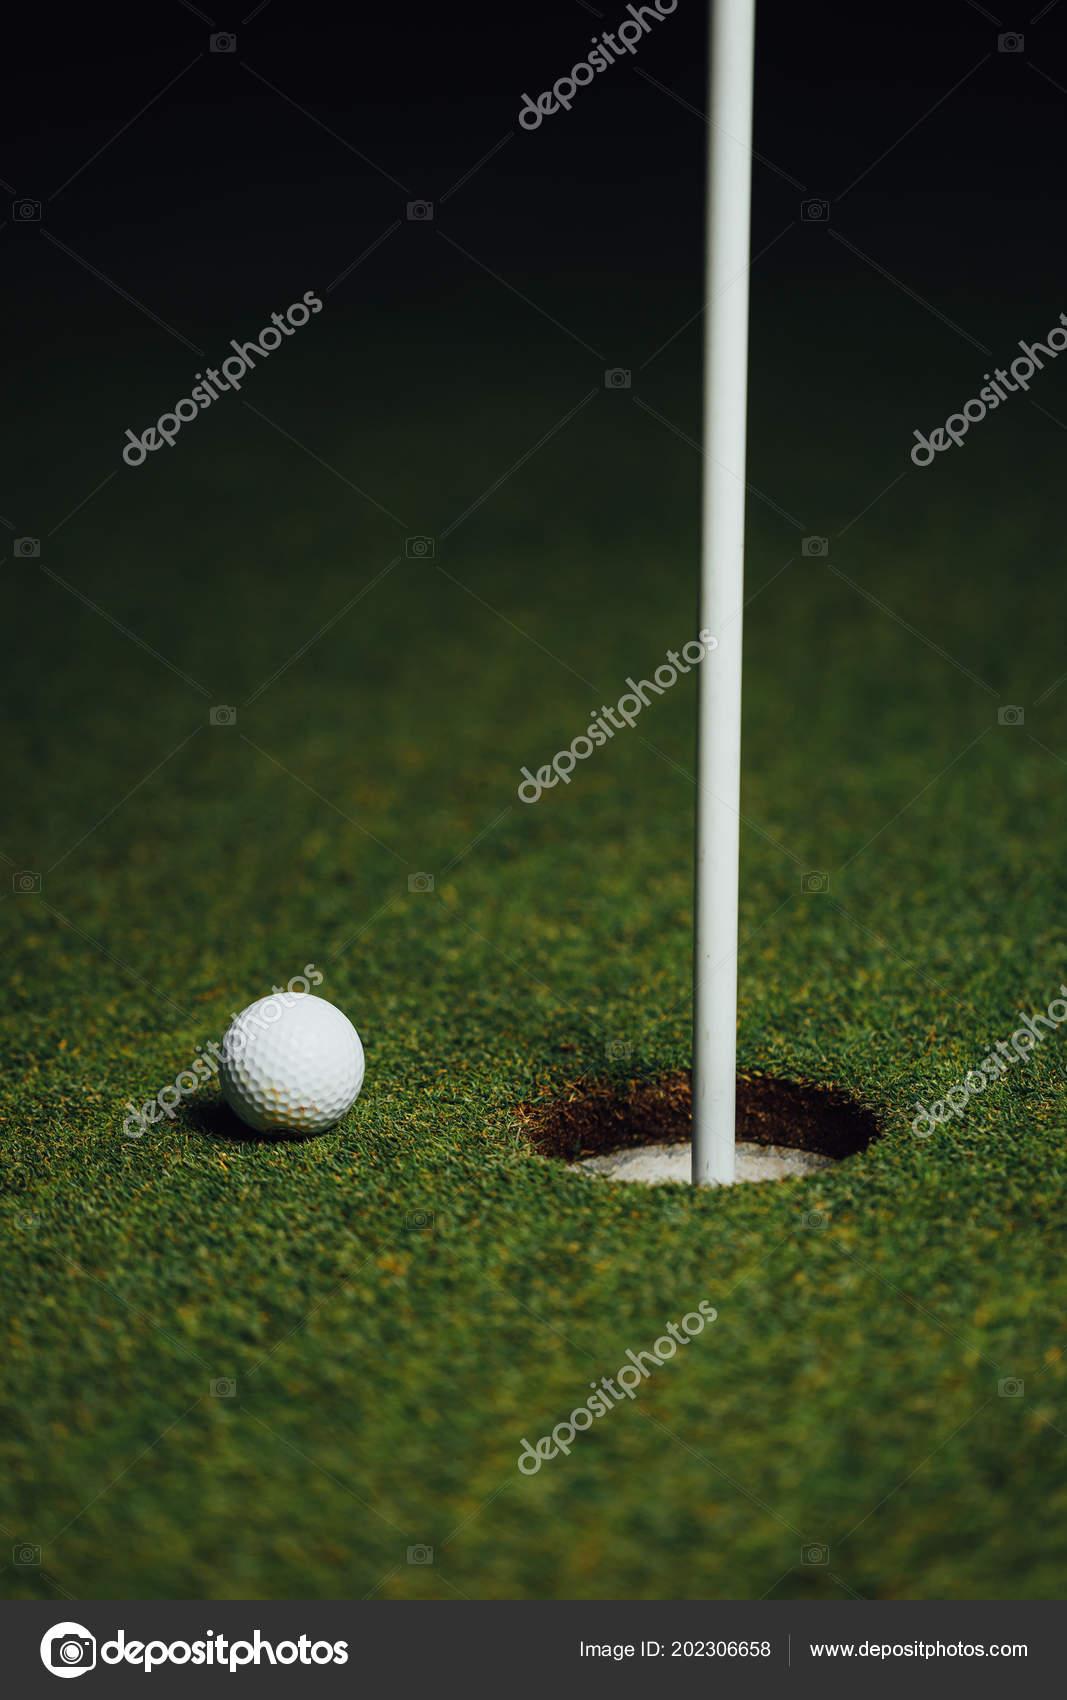 cff2cce4136b Golf Ball Nearby Hole Pin Flag Green Grass Background Closeup — Stock  Photo. Golf Course Supplies